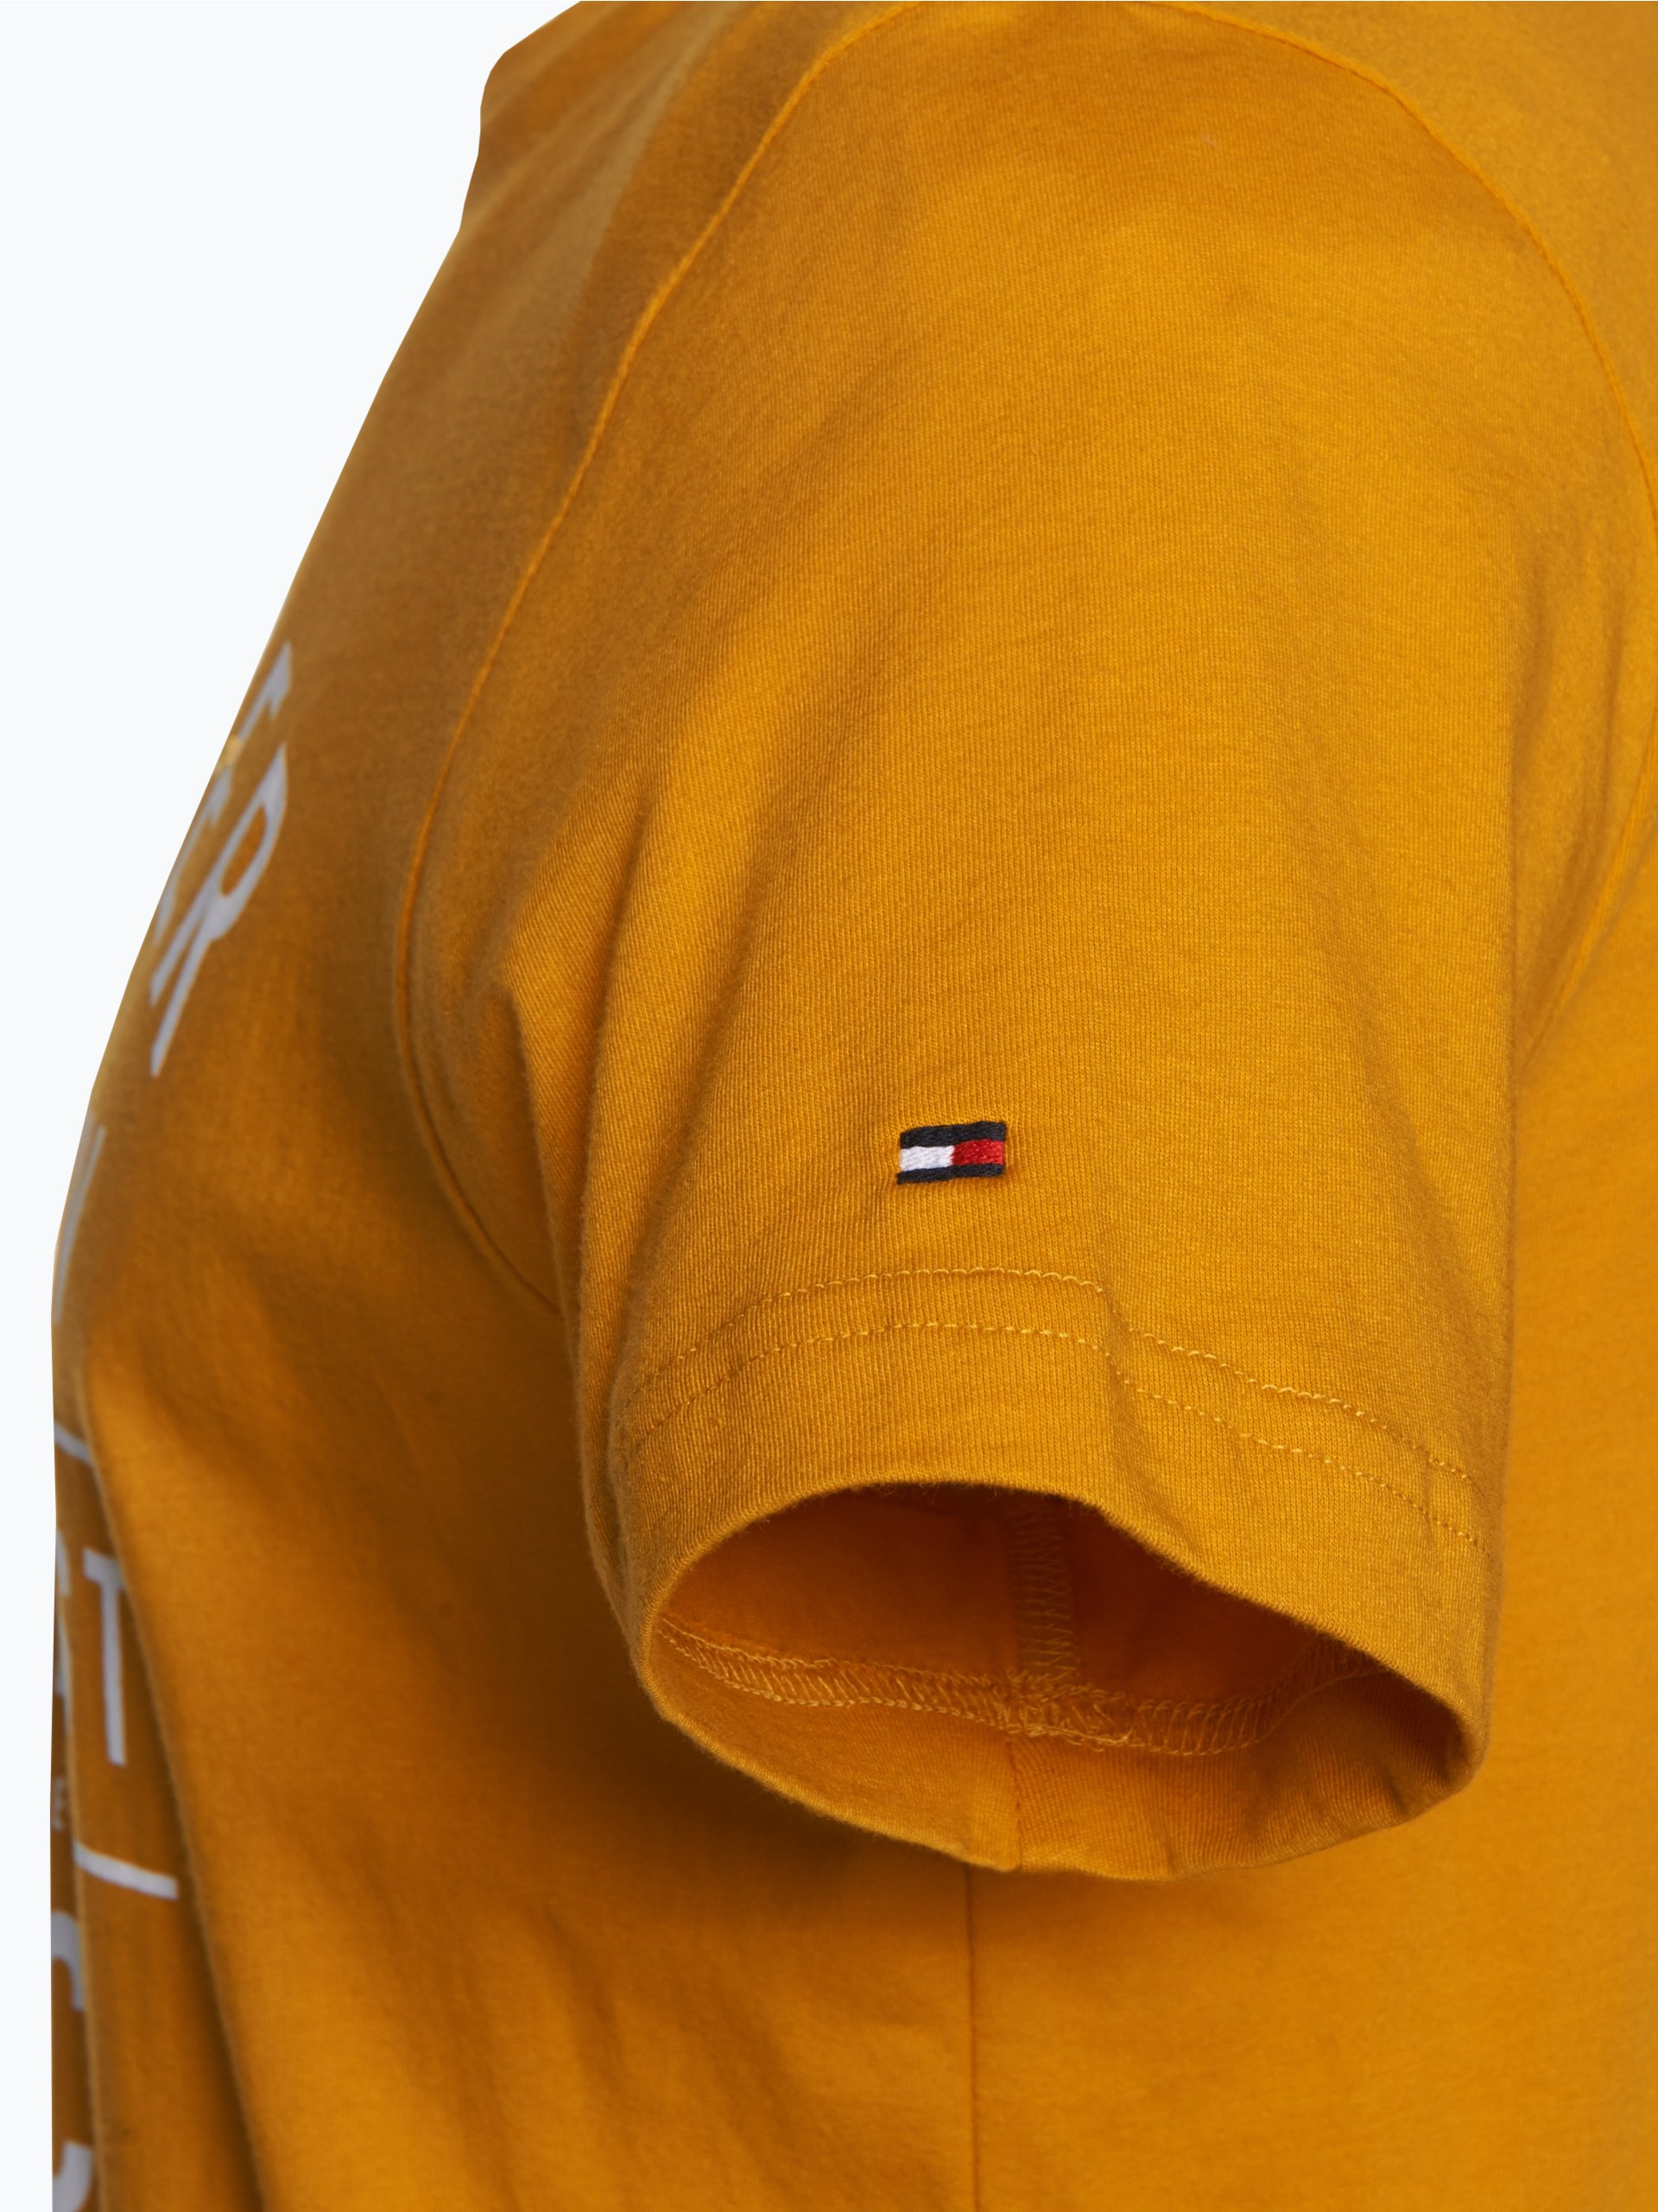 tommy hilfiger herren t shirt ryan gelb gemustert online. Black Bedroom Furniture Sets. Home Design Ideas